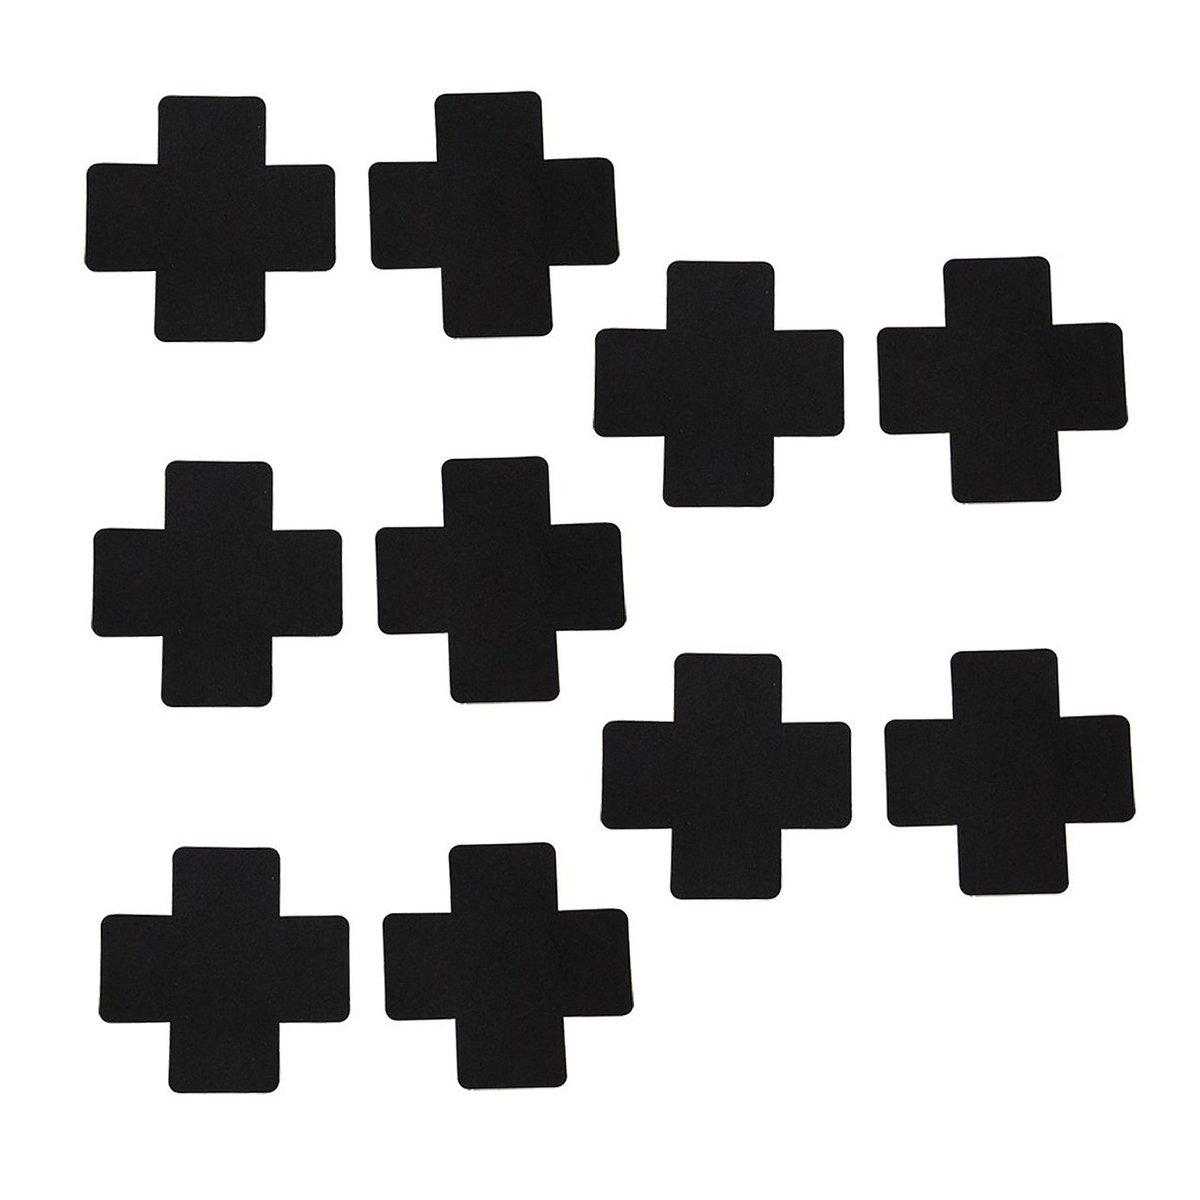 Tinksky 5 Pairs Disposable Petals Pasties Breast Nipple Cover Stickers (Black) 9C194839GORFJ5007